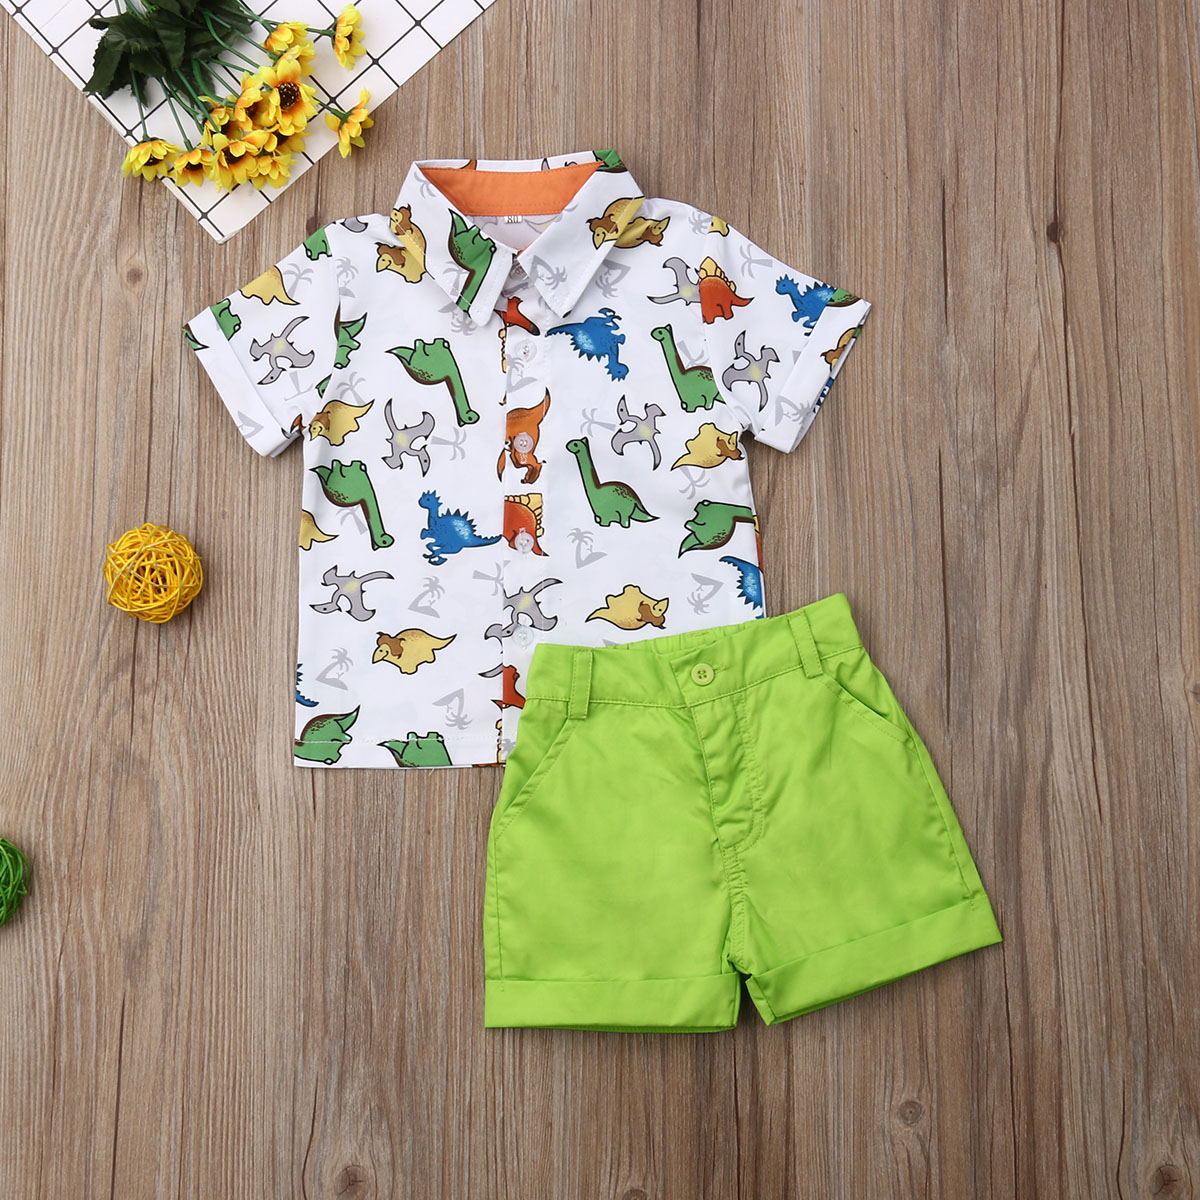 Emmababy Summer Toddler Baby Boy Clothes Multi Dinosaur Print Shirt Tops Short Pants 2Pcs Outfits Casual Clothes Summer